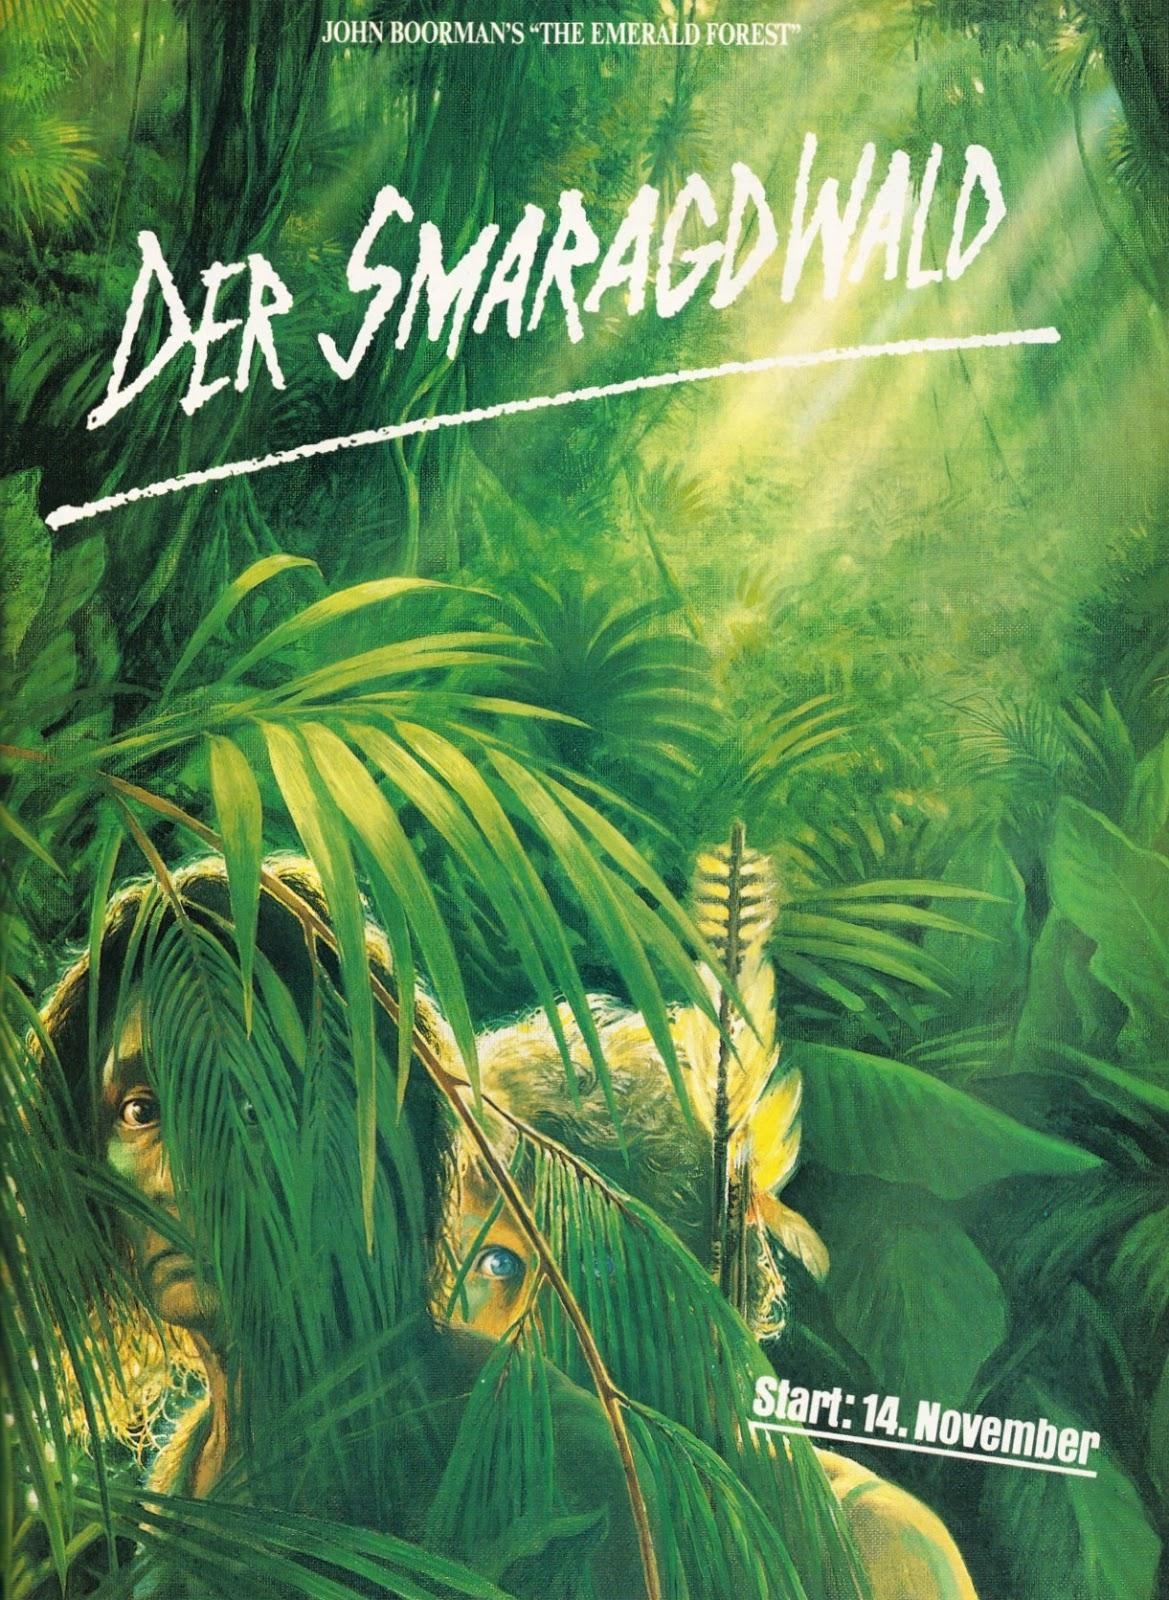 Der Smaragdwald